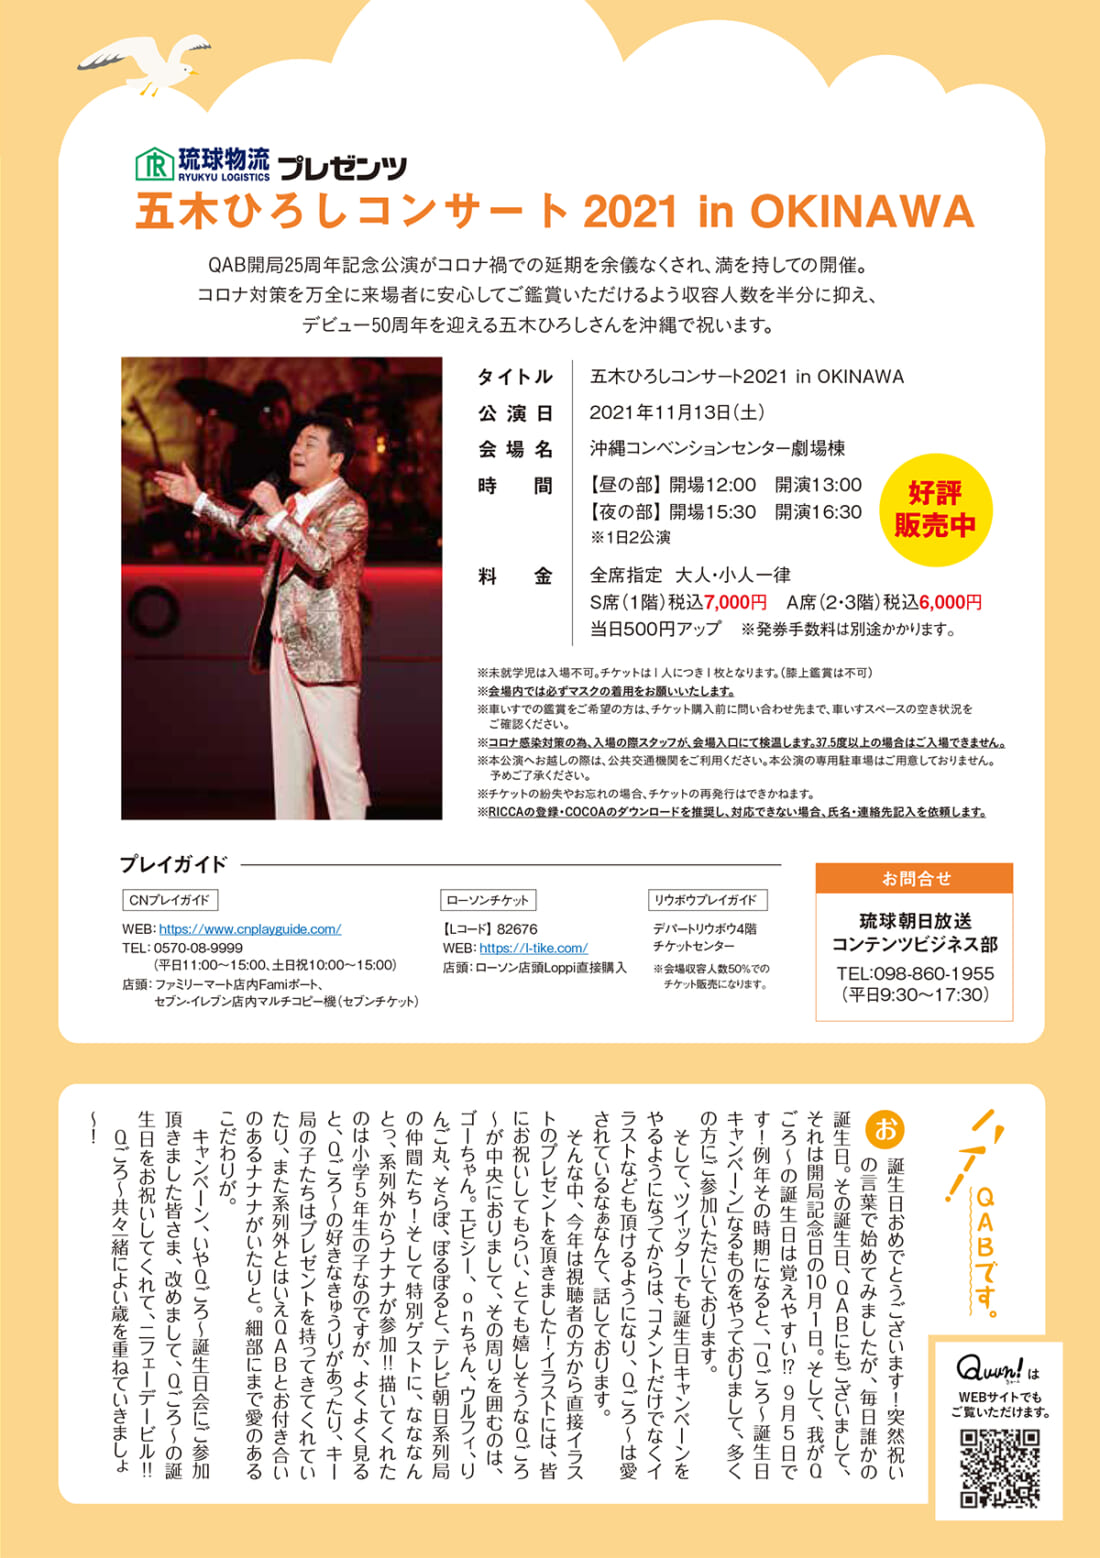 https://www.qab.co.jp/qgoro/wp-content/uploads/quun_1616-1100x1558.jpg